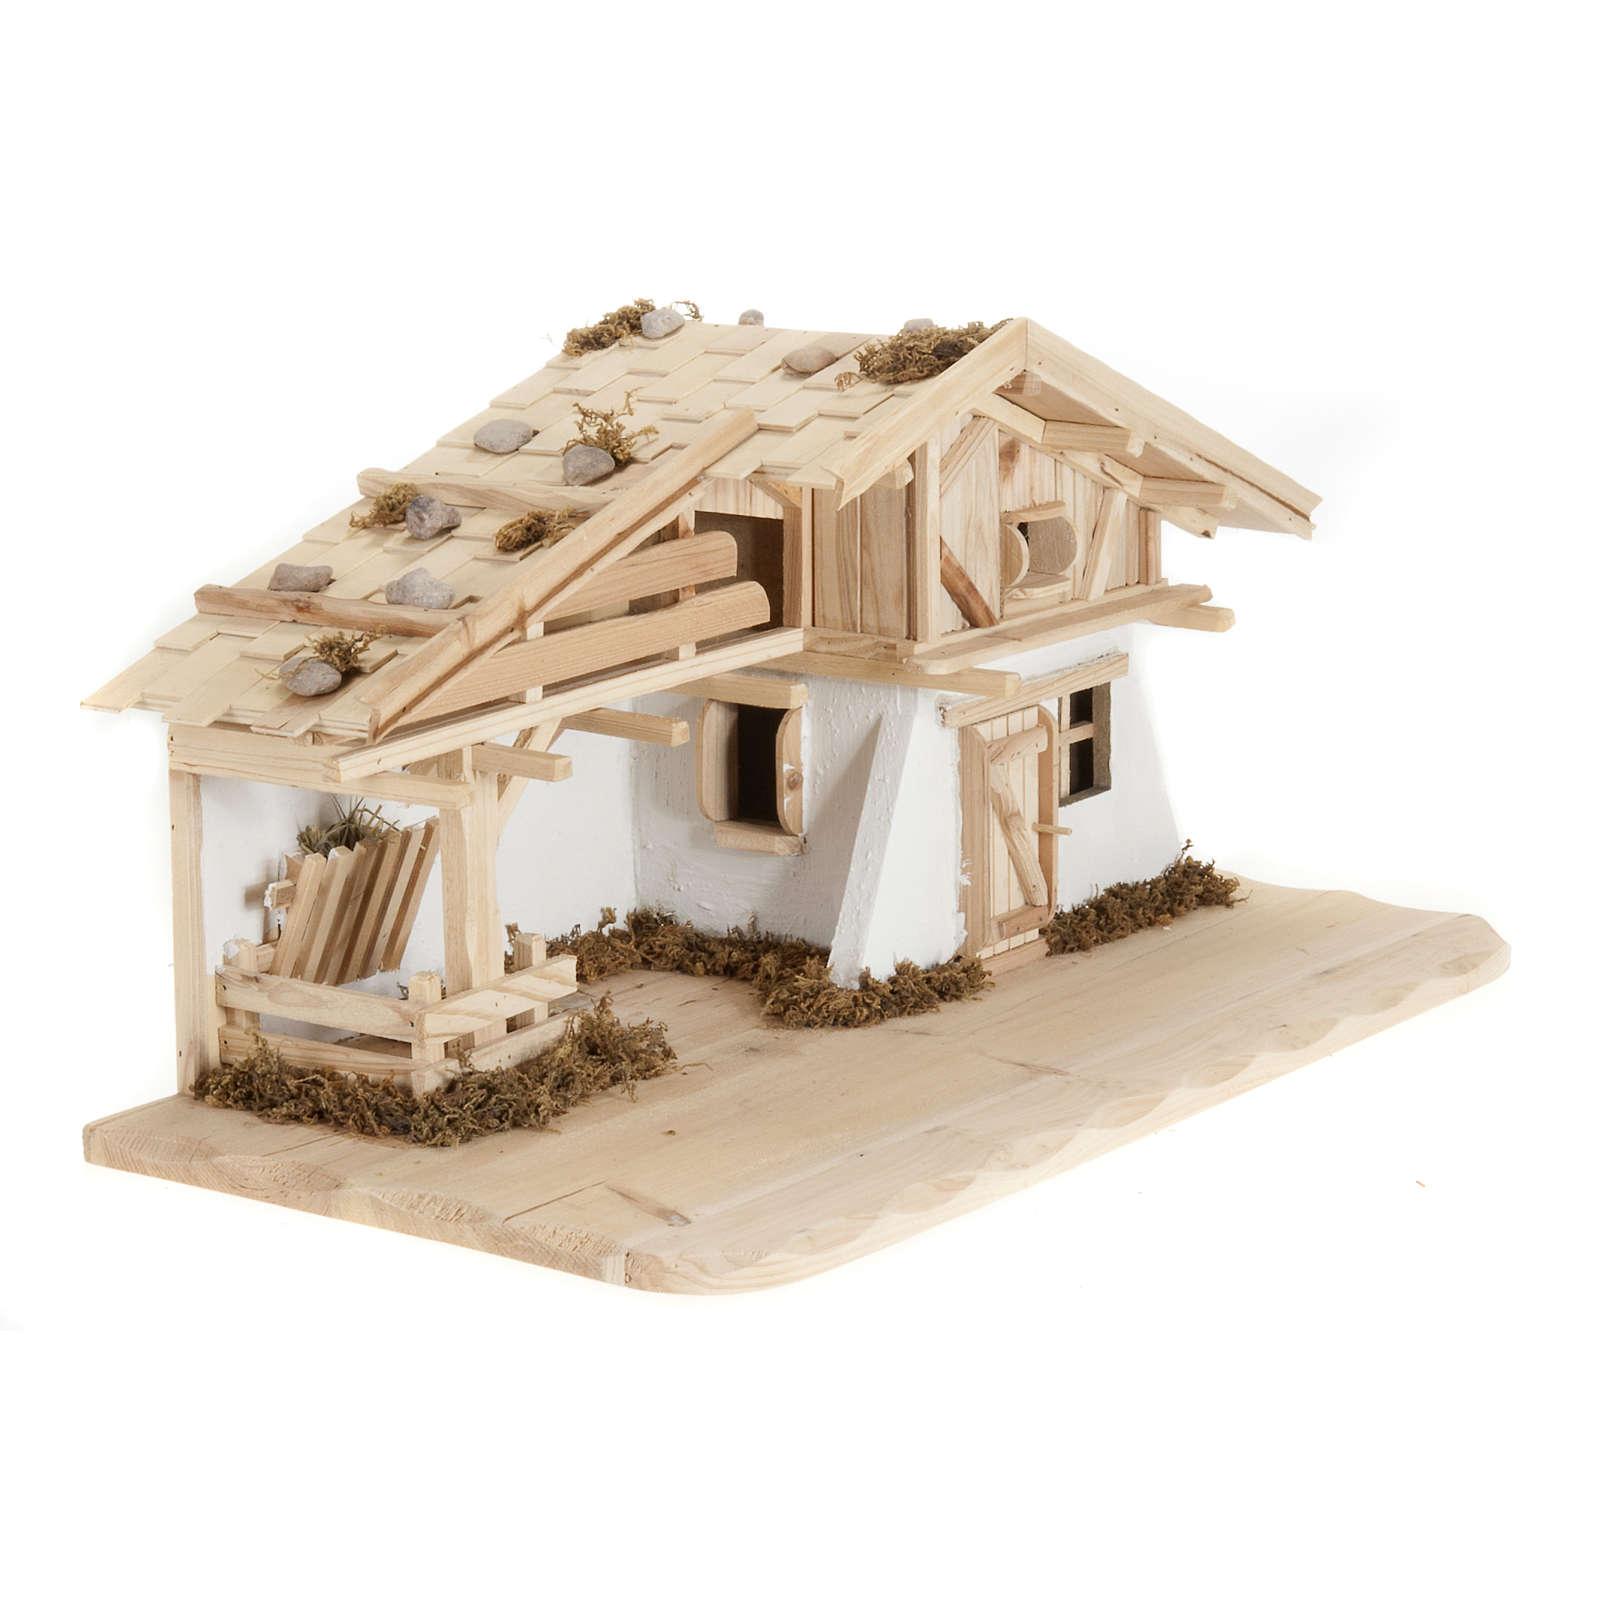 table cr che noel bois naturel 60x30x30 cm vente en ligne sur holyart. Black Bedroom Furniture Sets. Home Design Ideas